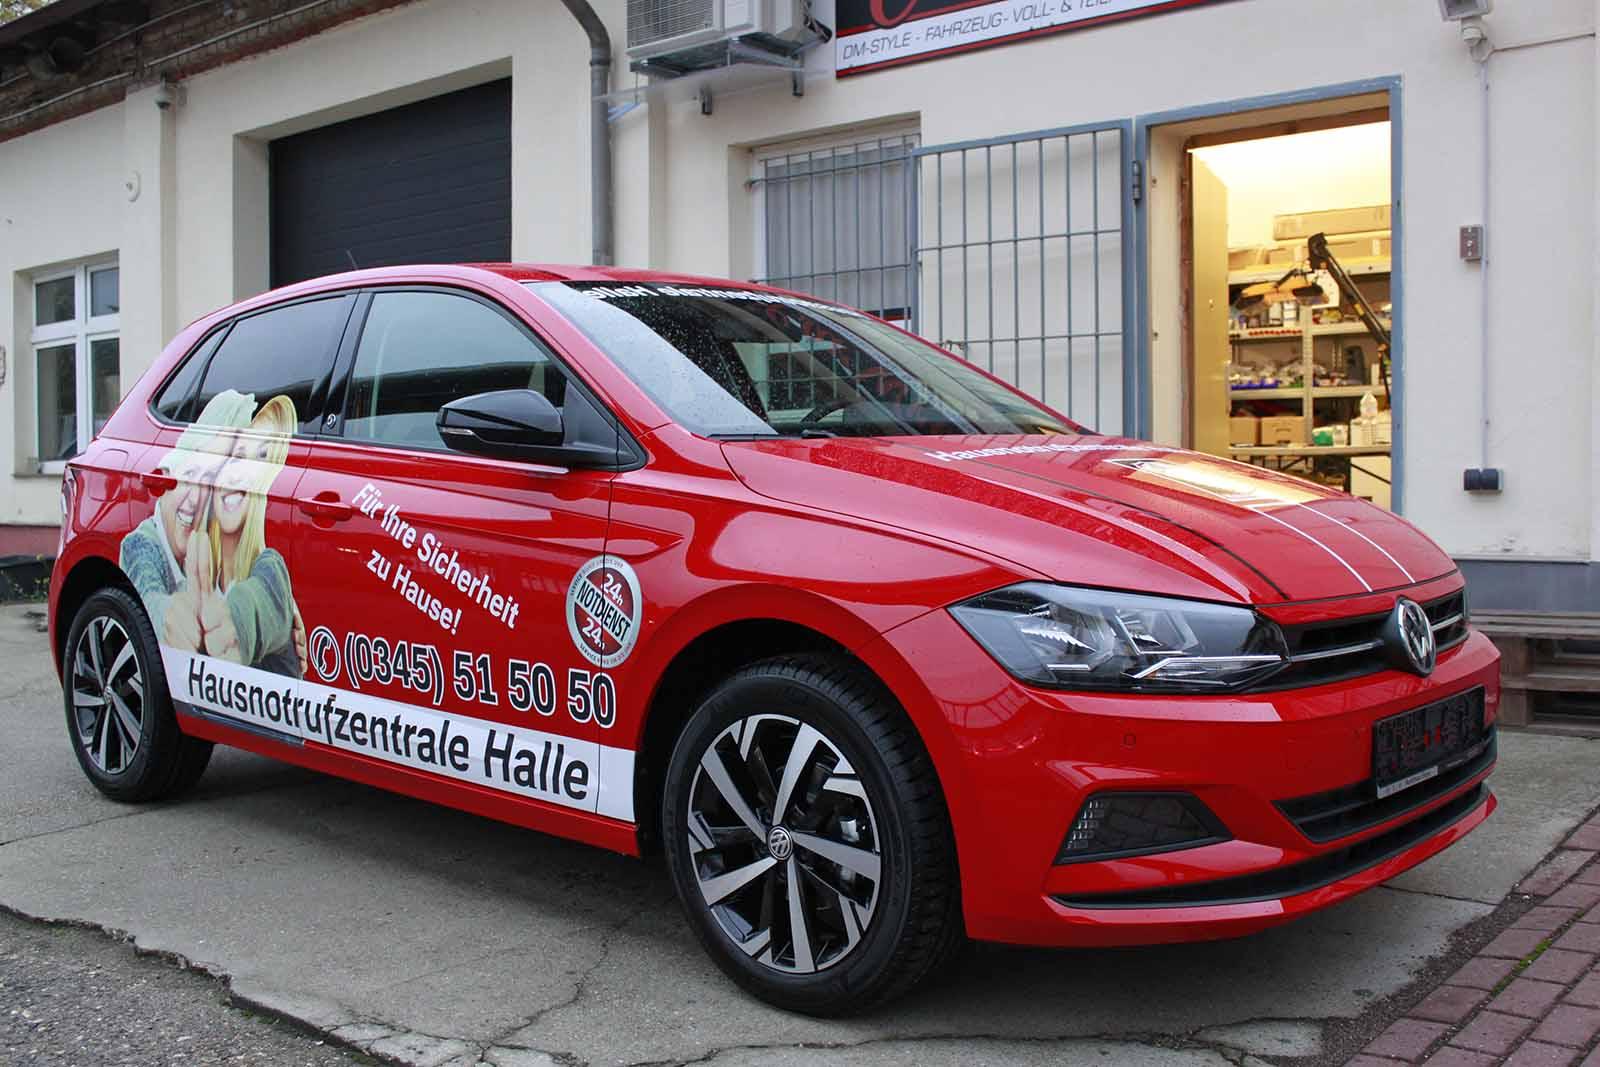 Auto folieren, Autofolierung Halle, Autowerbung, Fahrzeugwerbung VW Polo rot